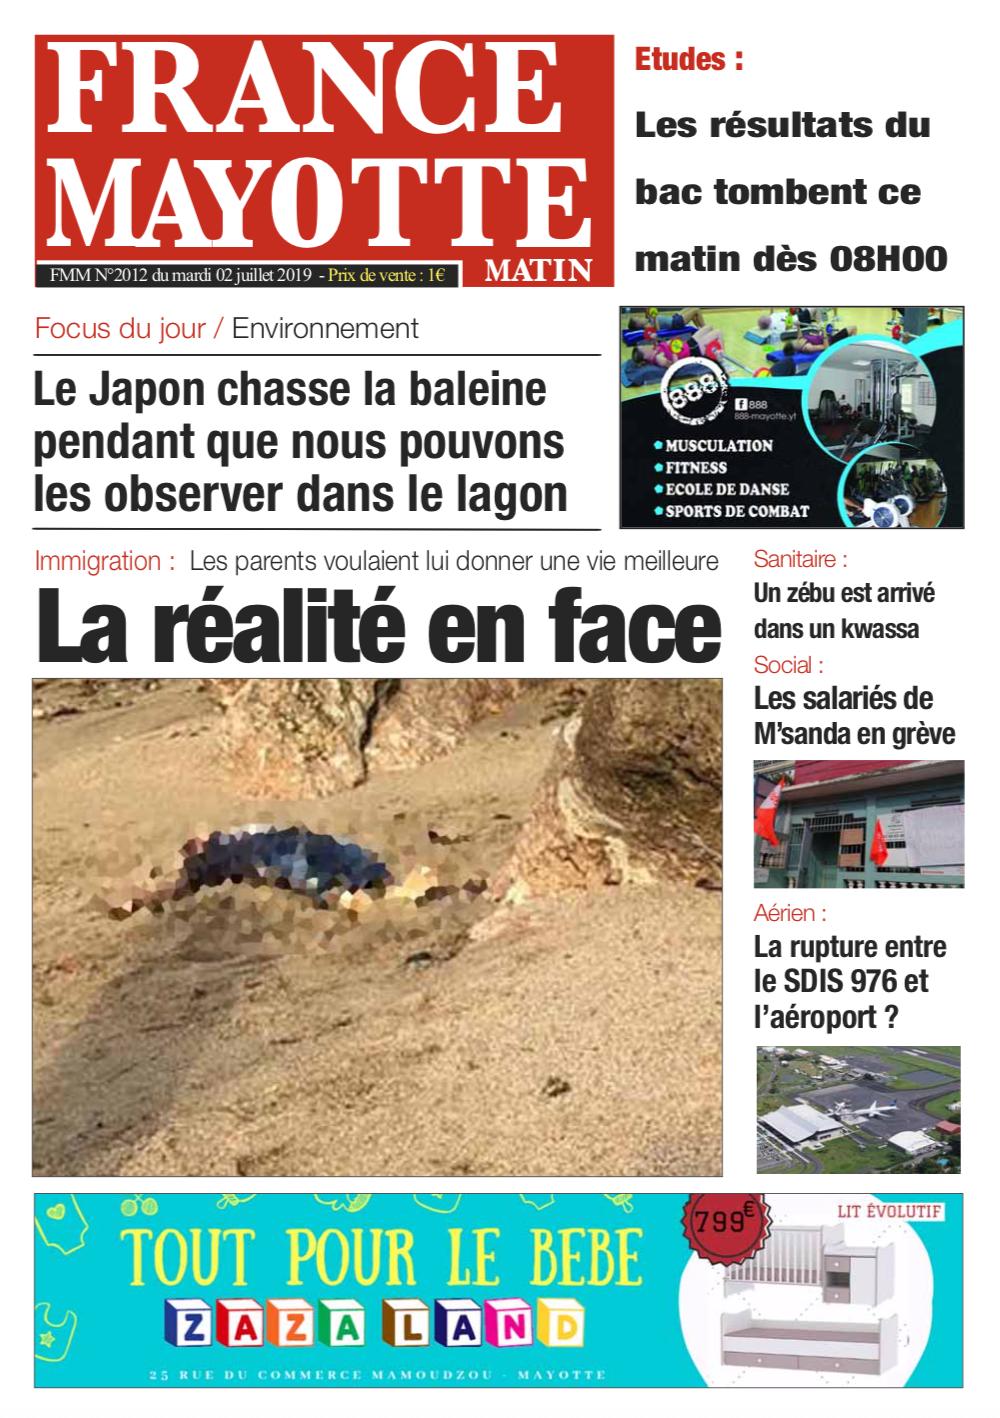 France Mayotte Mardi 2 juillet 2019